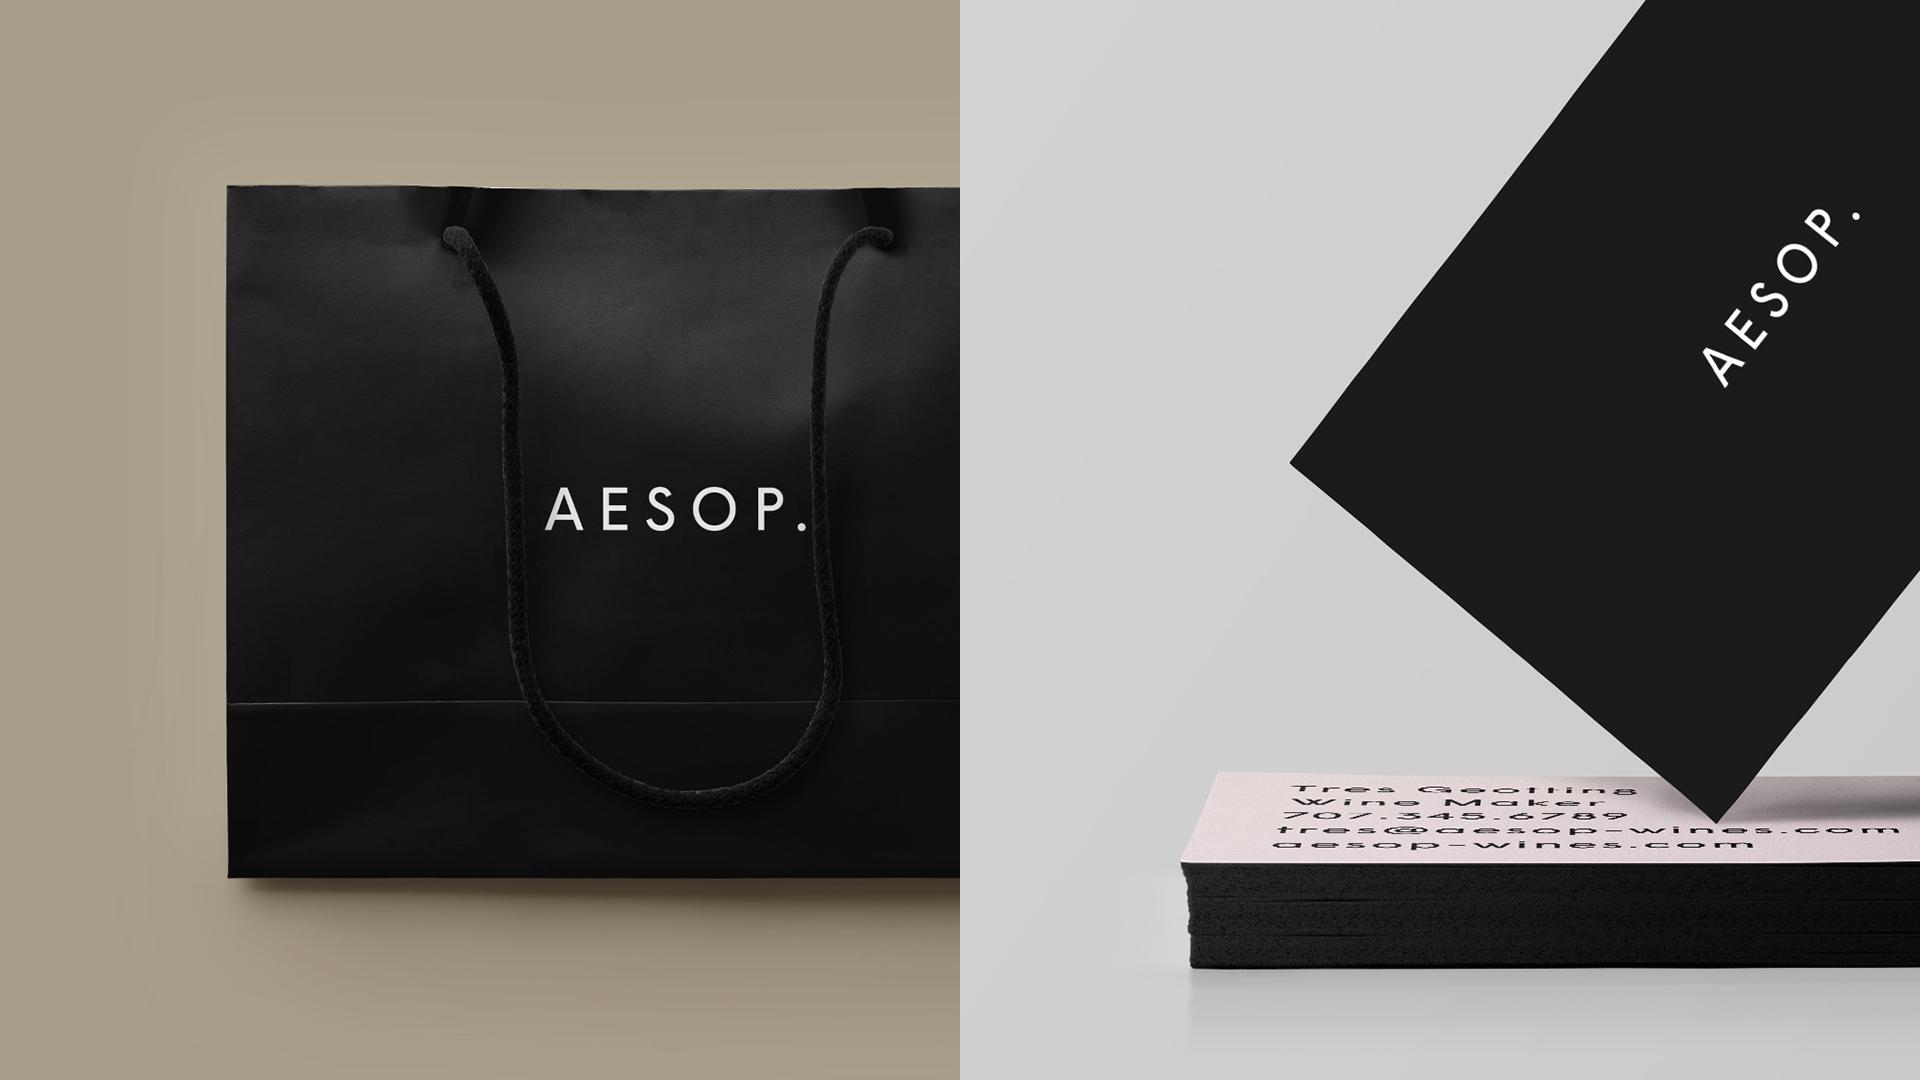 Aesop_System.jpg